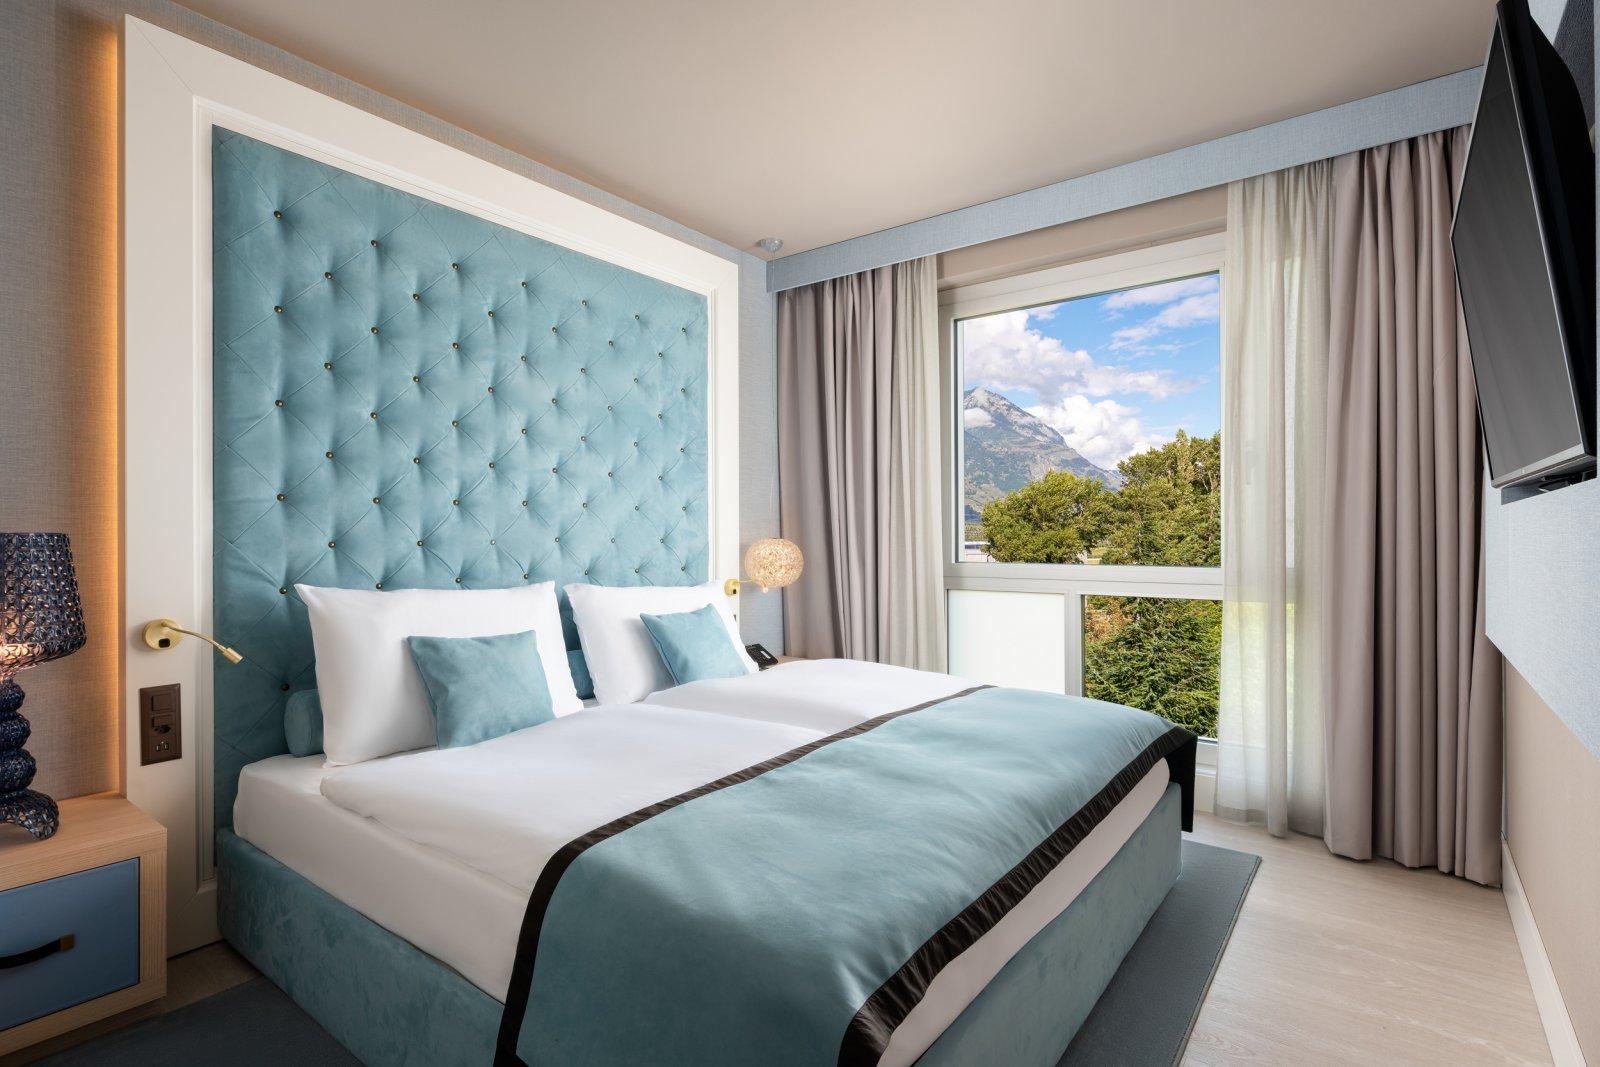 Hotels Vatel Martigny (Suisse) #30